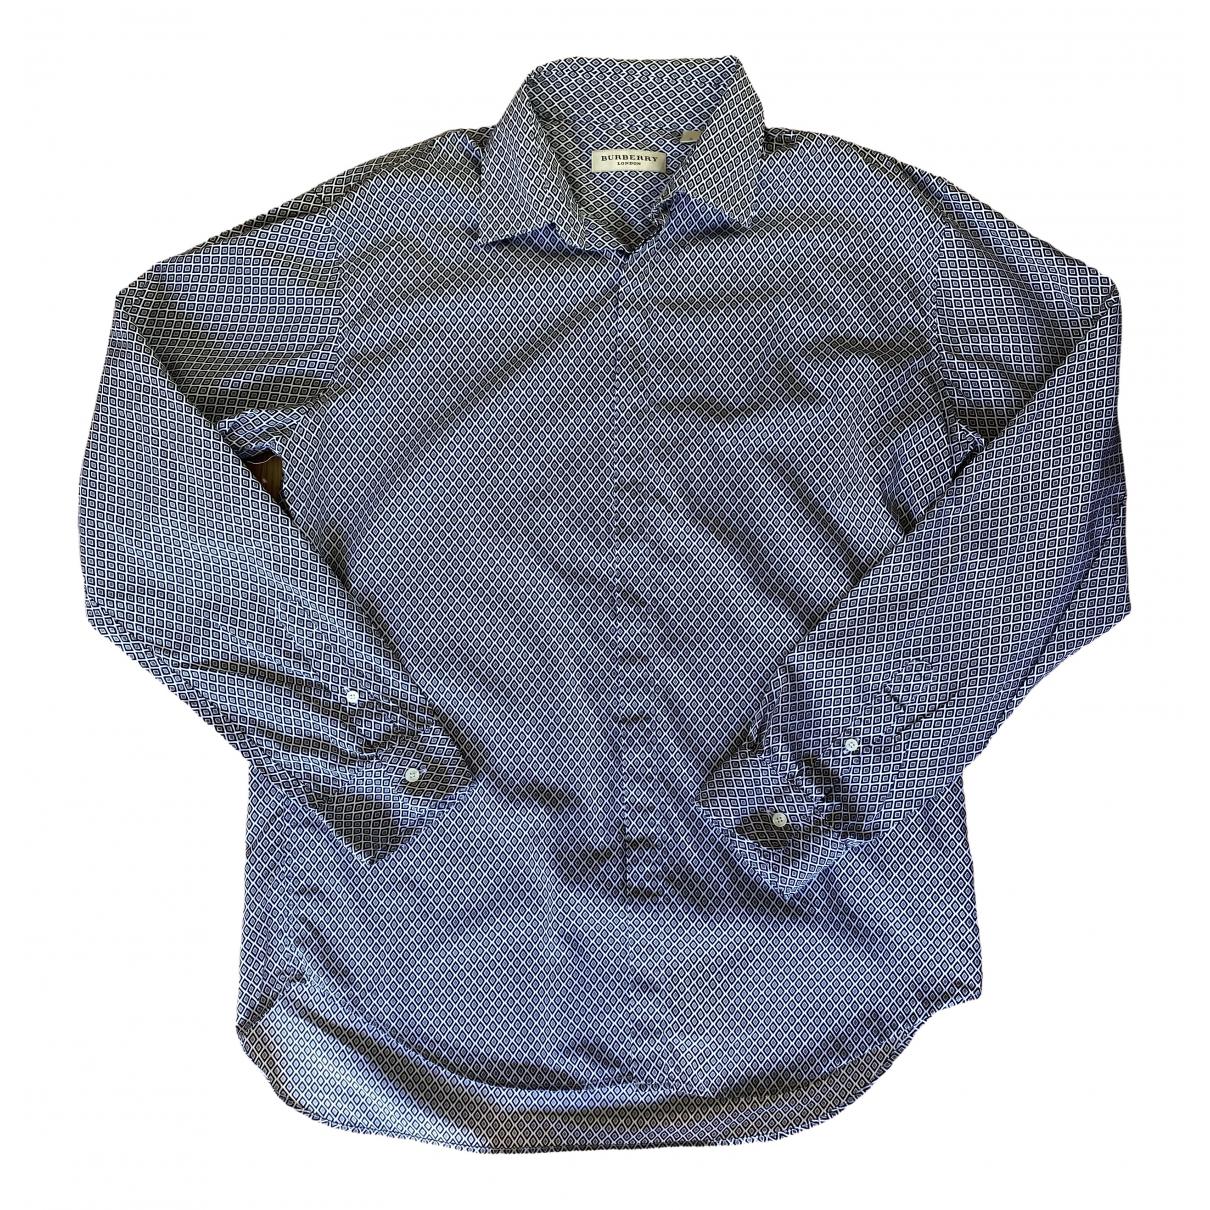 Burberry \N Multicolour Cotton Shirts for Men L International